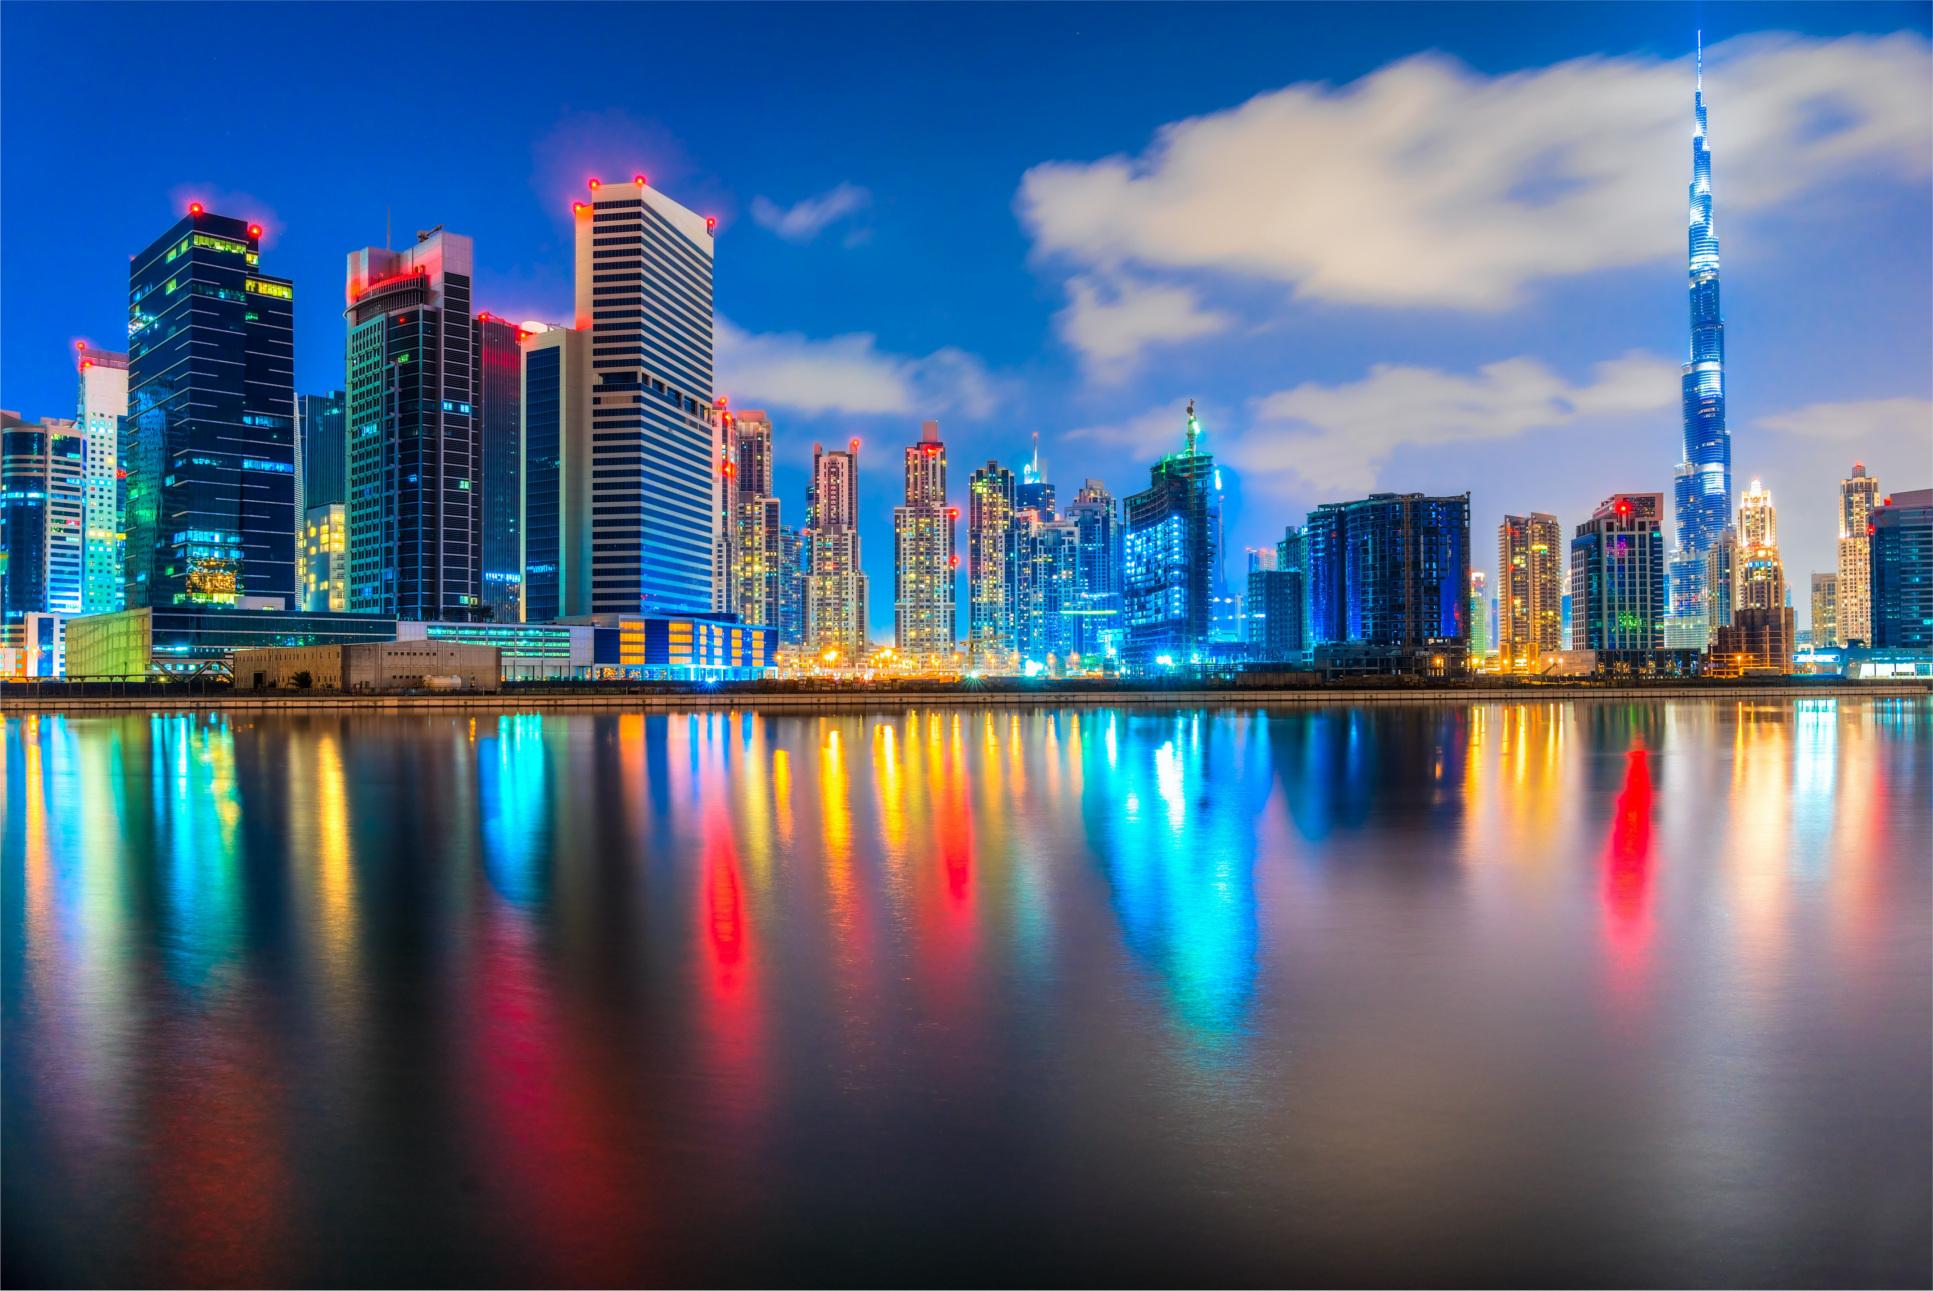 burj khalifa Dubai Tour 2016